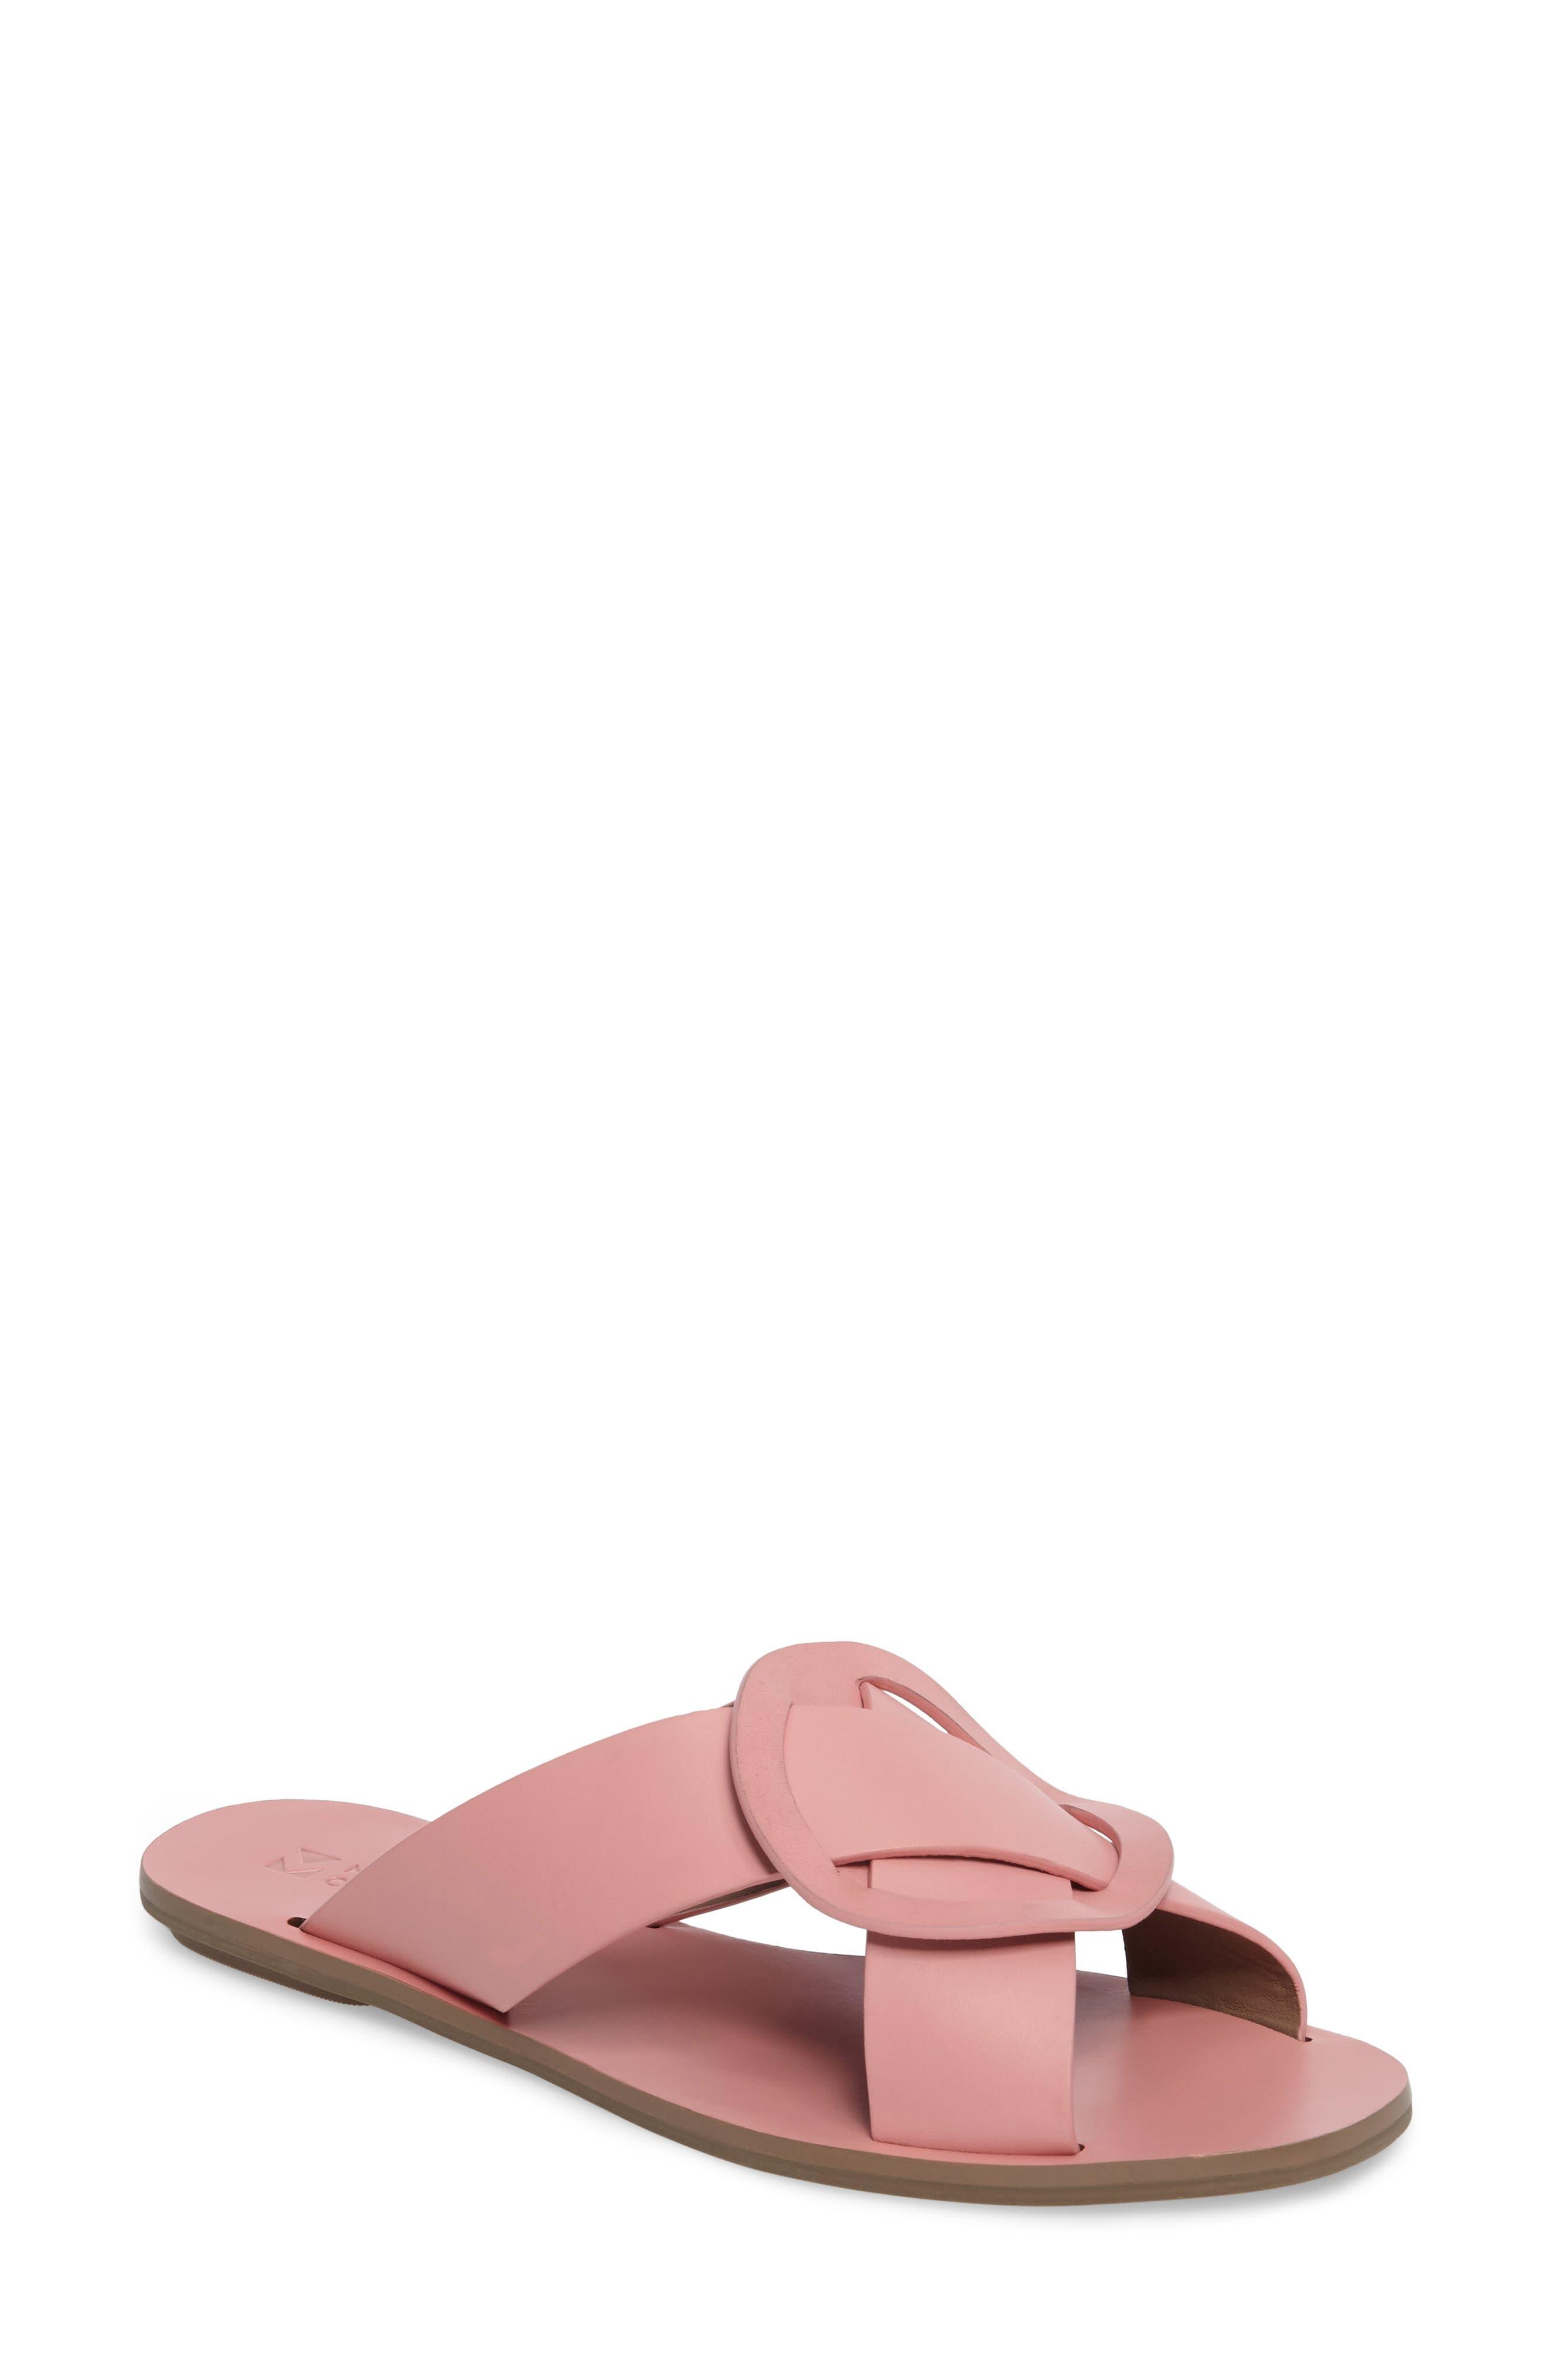 Carlein Slide Sandal,                             Main thumbnail 1, color,                             Pink Peony Leather